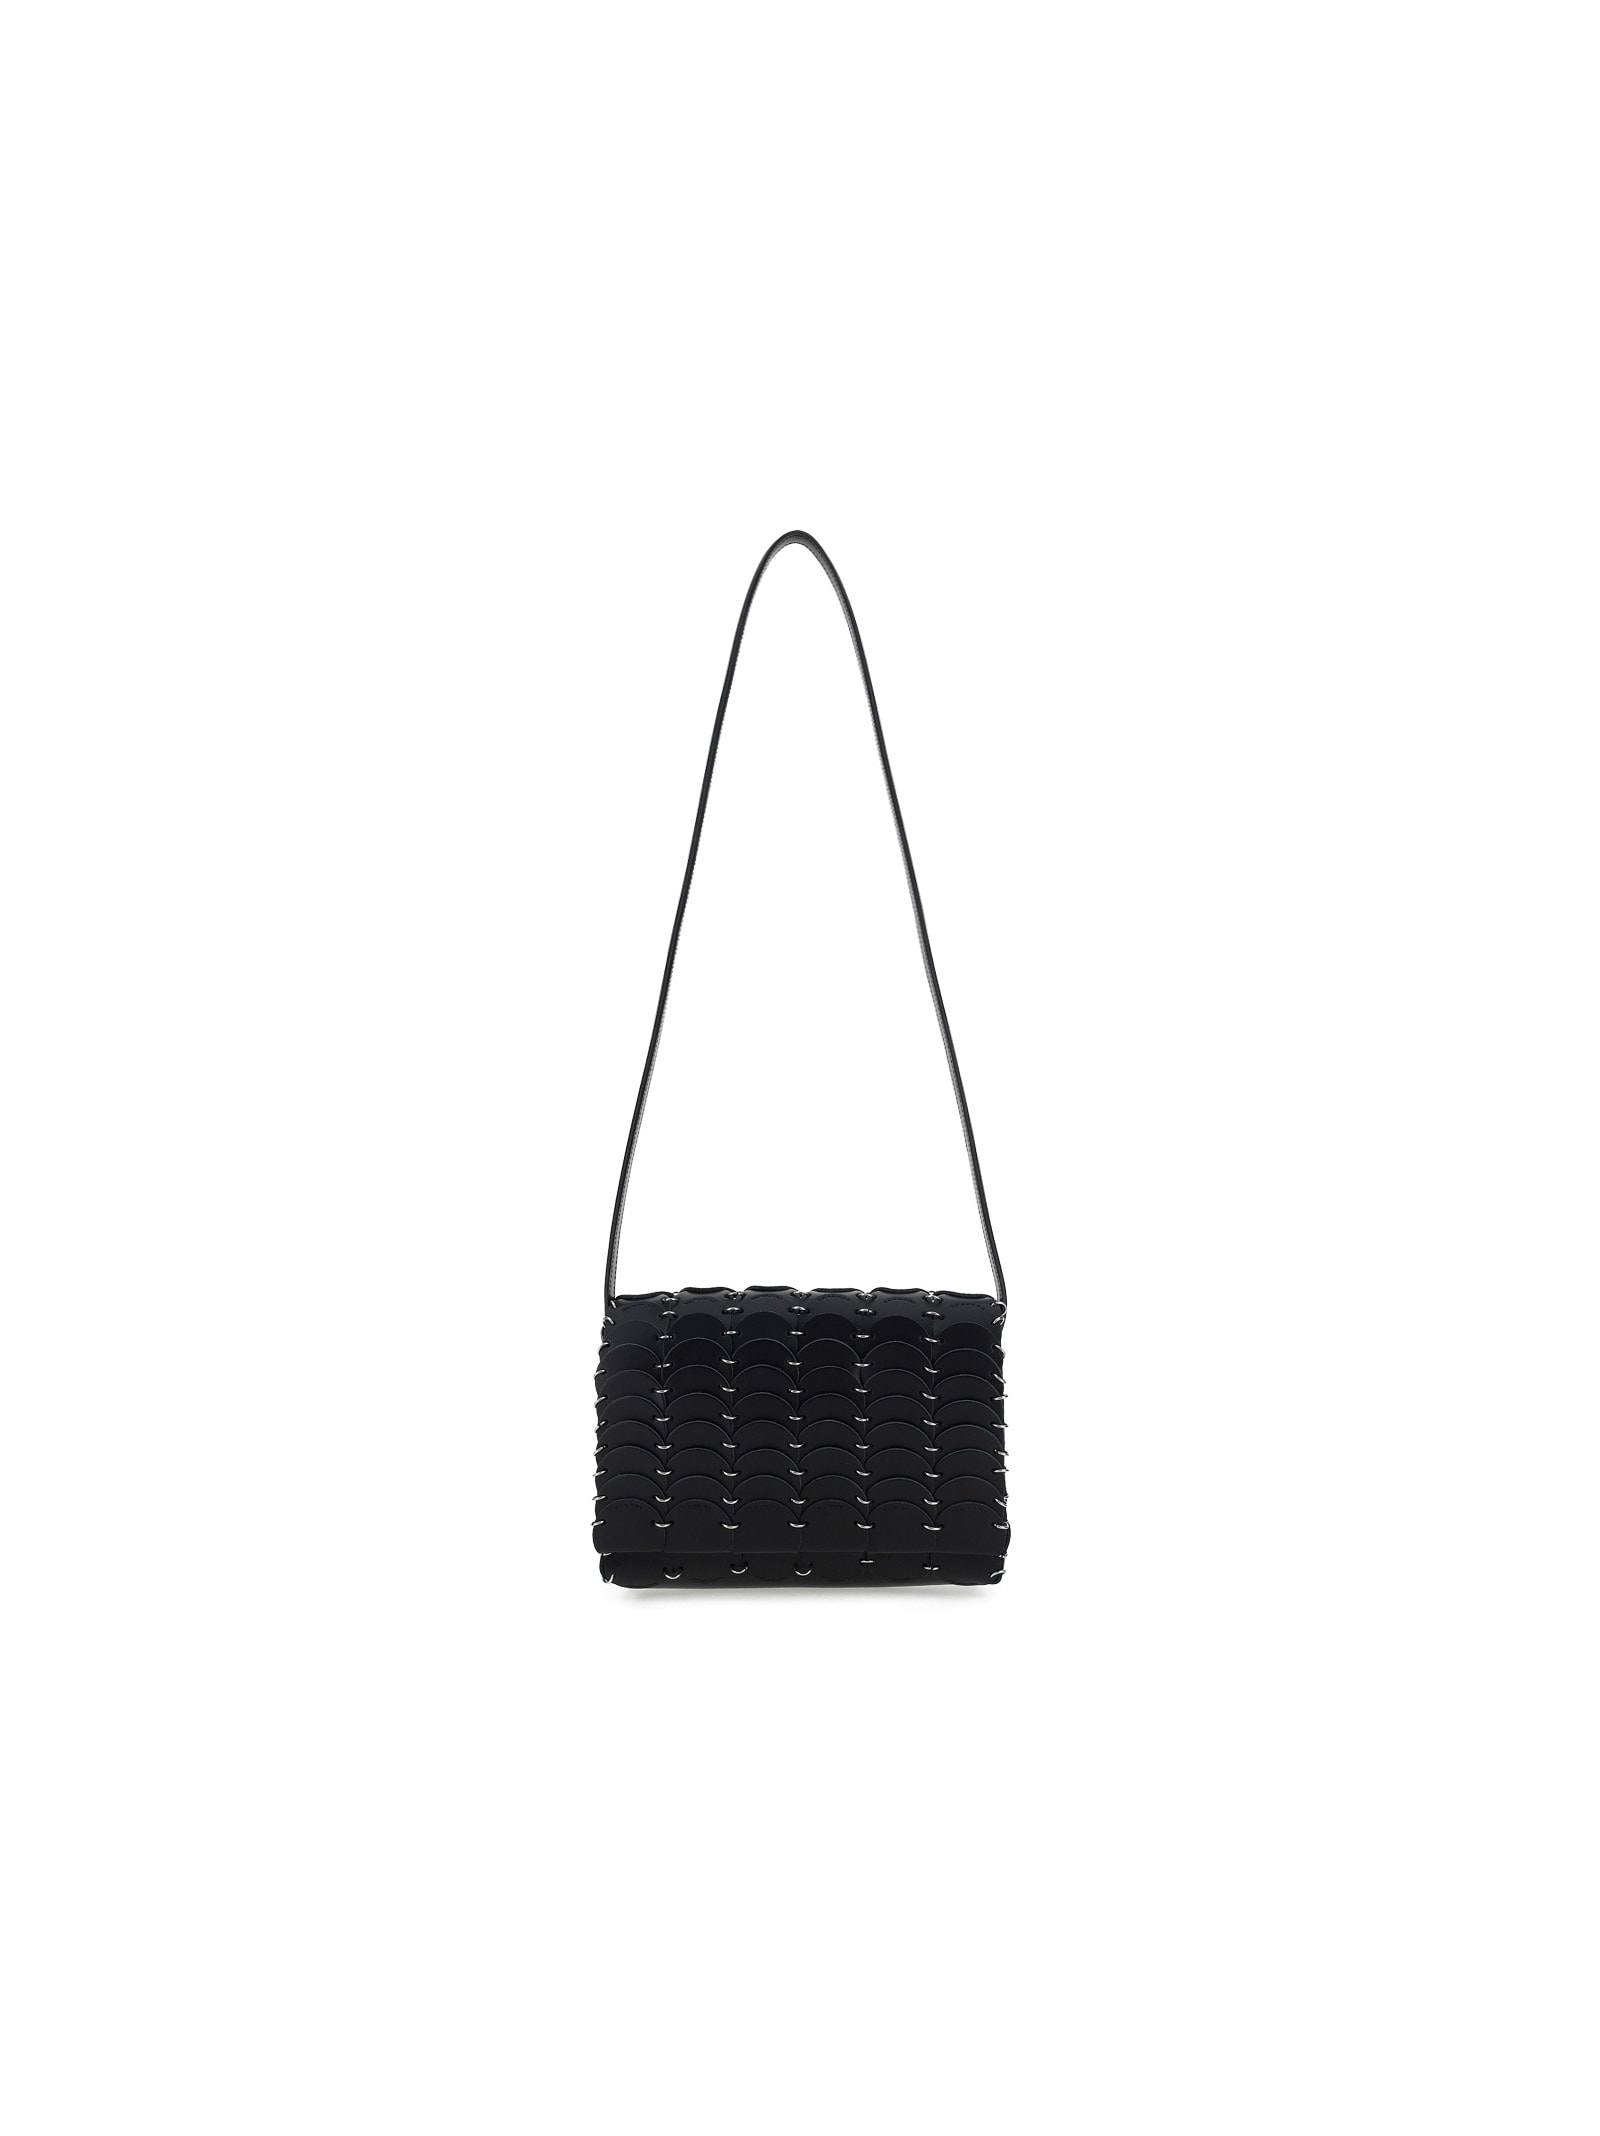 Paco Rabanne Pacoio Shoulder Bag In Black